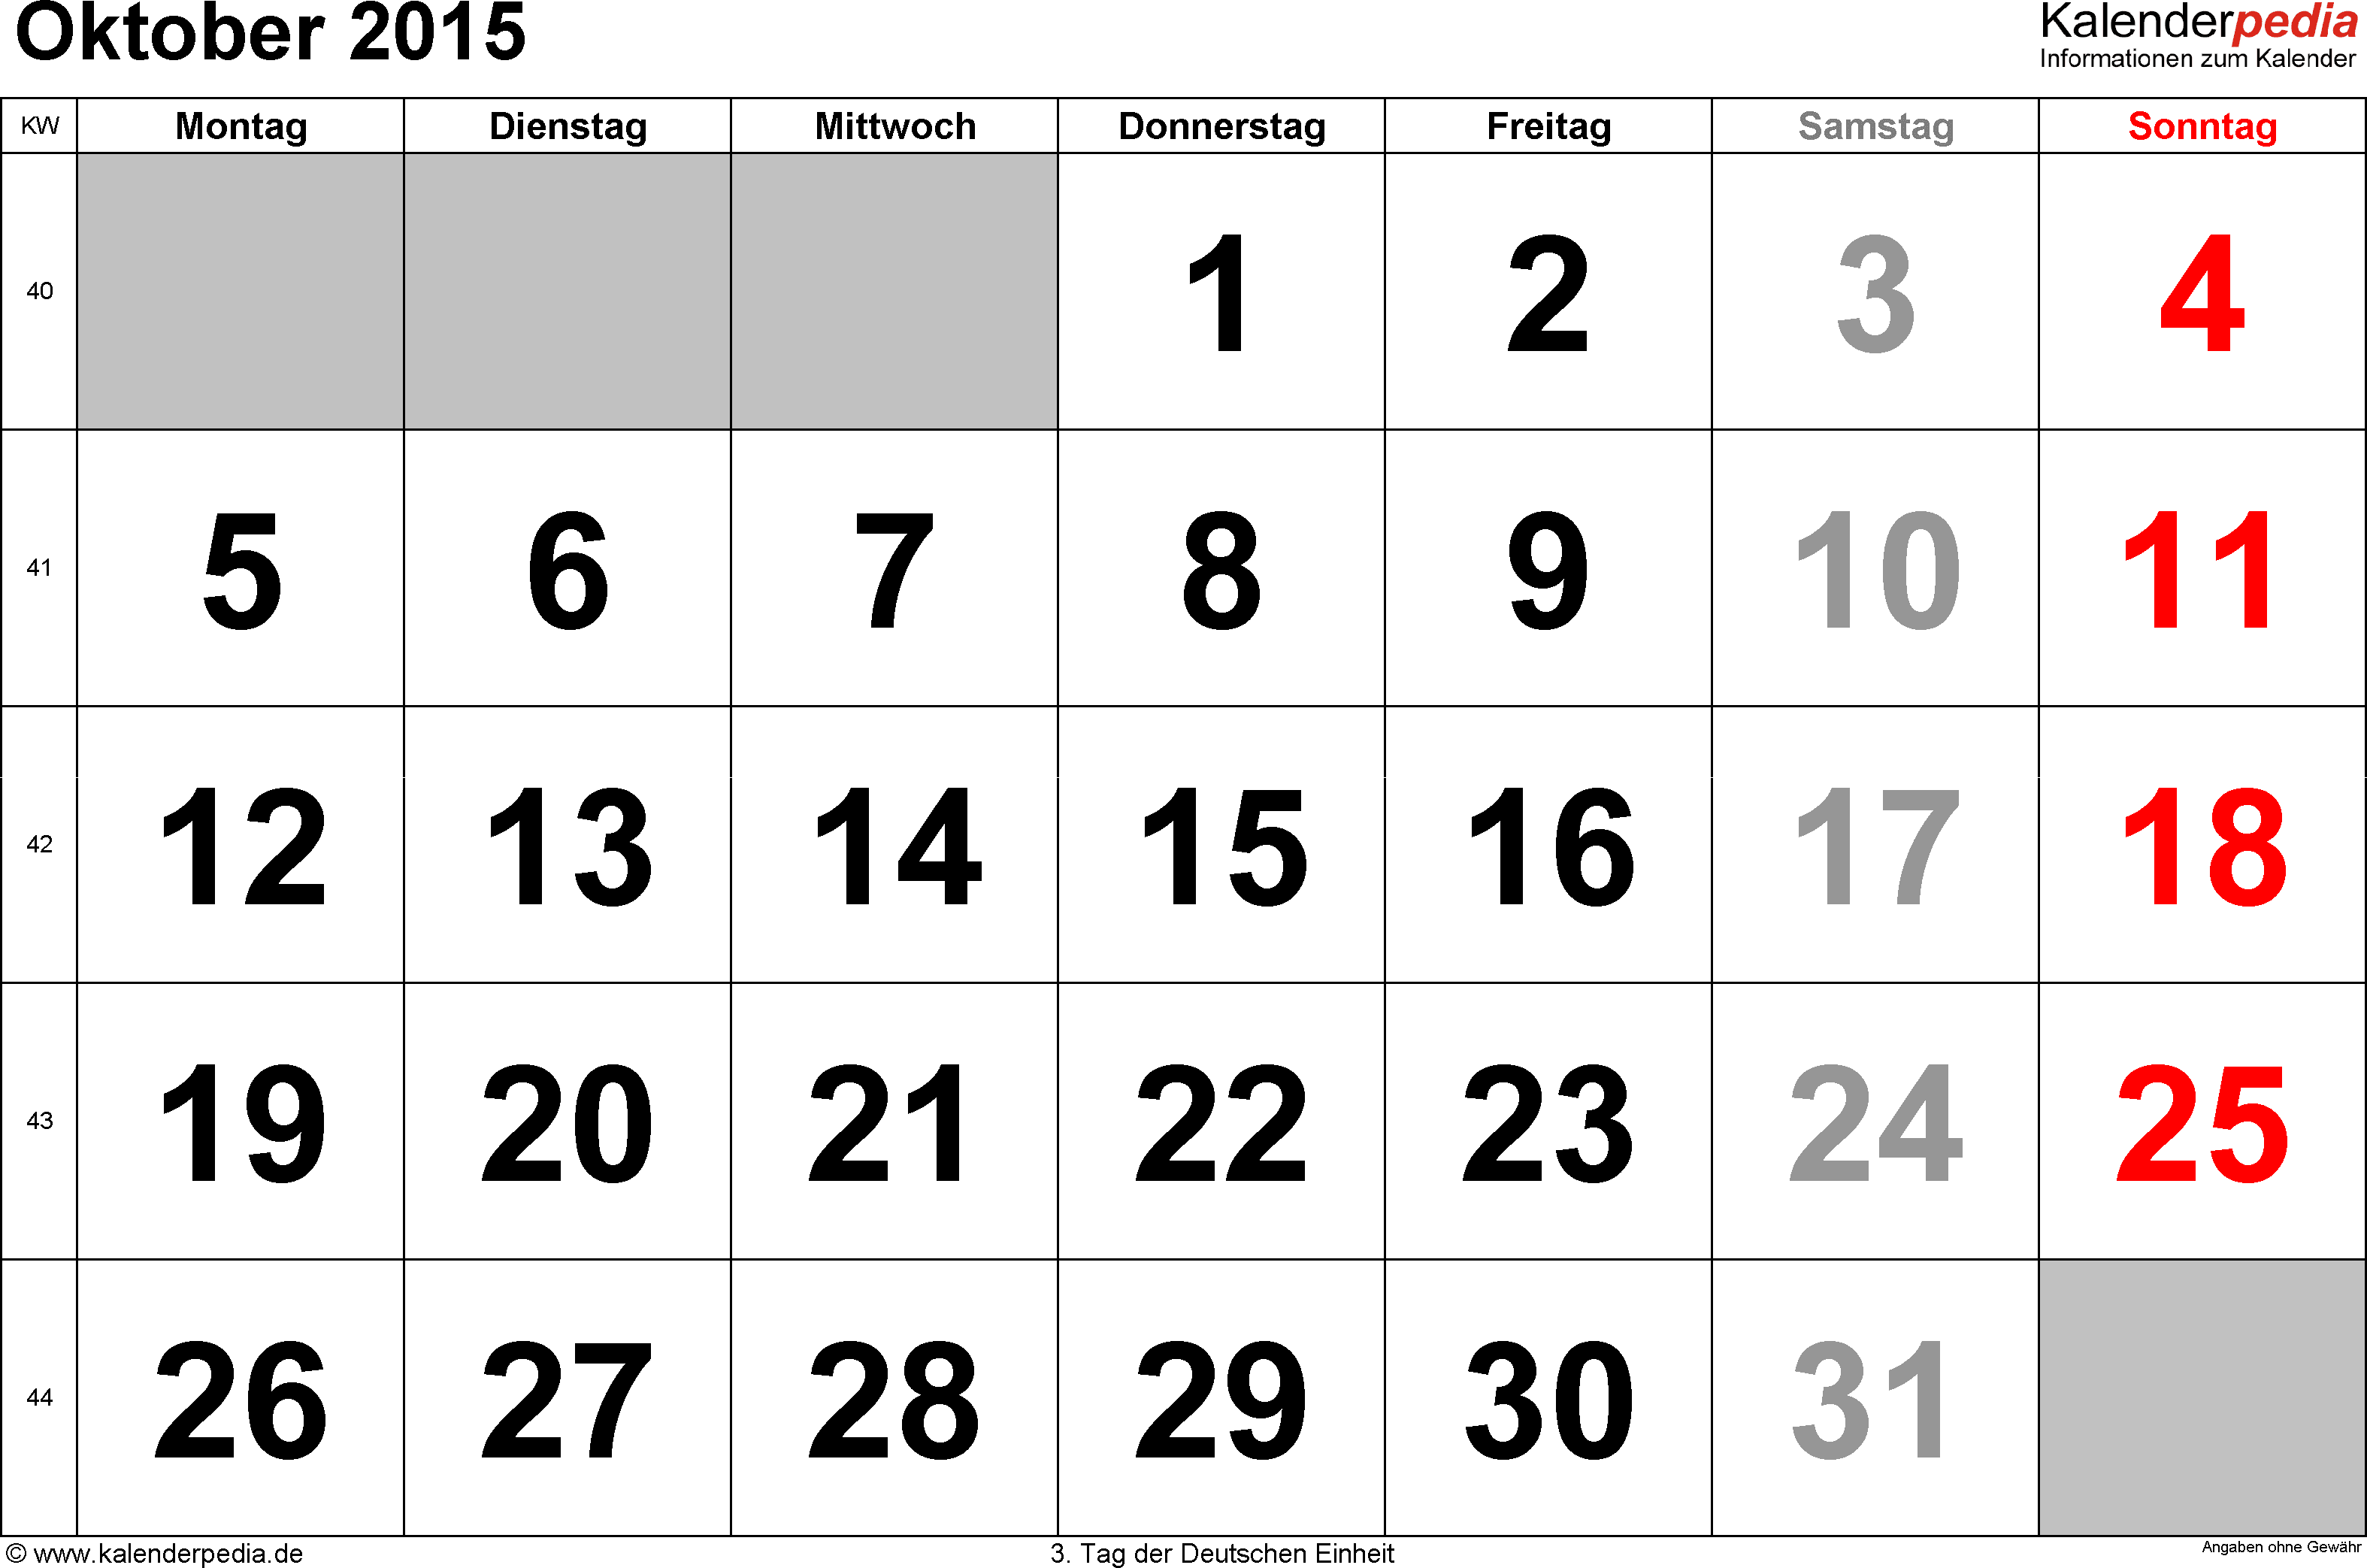 Kalender October 2015 im Querformat, grosse Ziffern